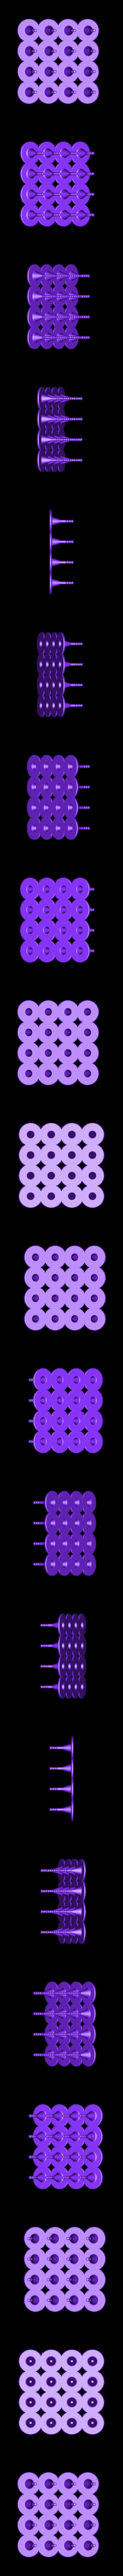 GeoBoard4x4_B.stl Download free STL file Geoboard, Geometric Board, Cartesian, Isometic, Circular, Geometry, Math • 3D printer object, LGBU